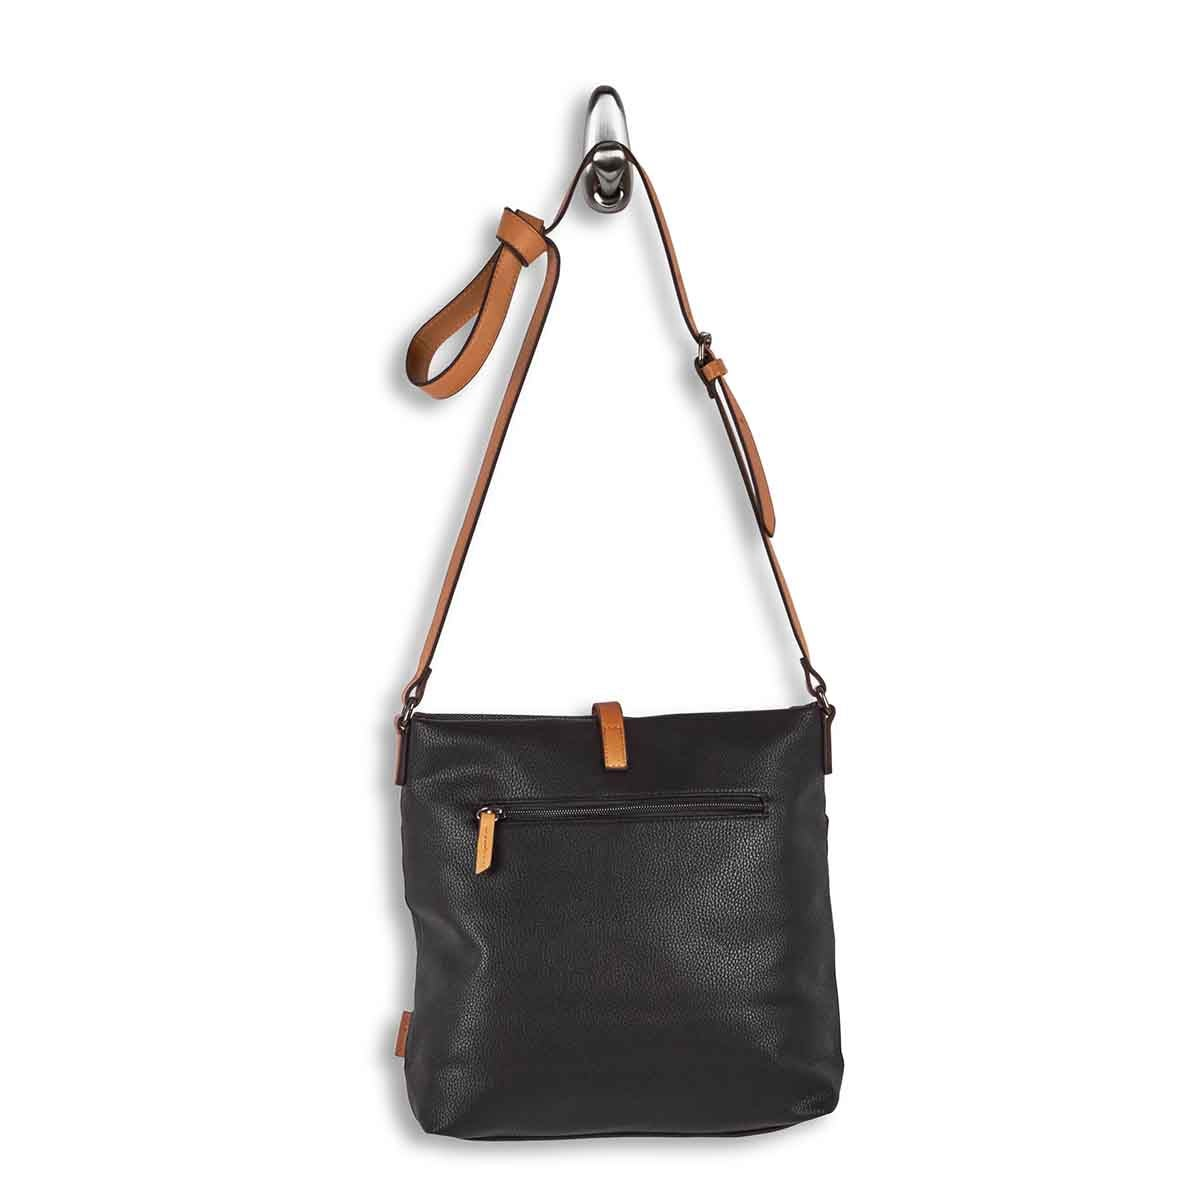 Lds black north/south crossbody bag